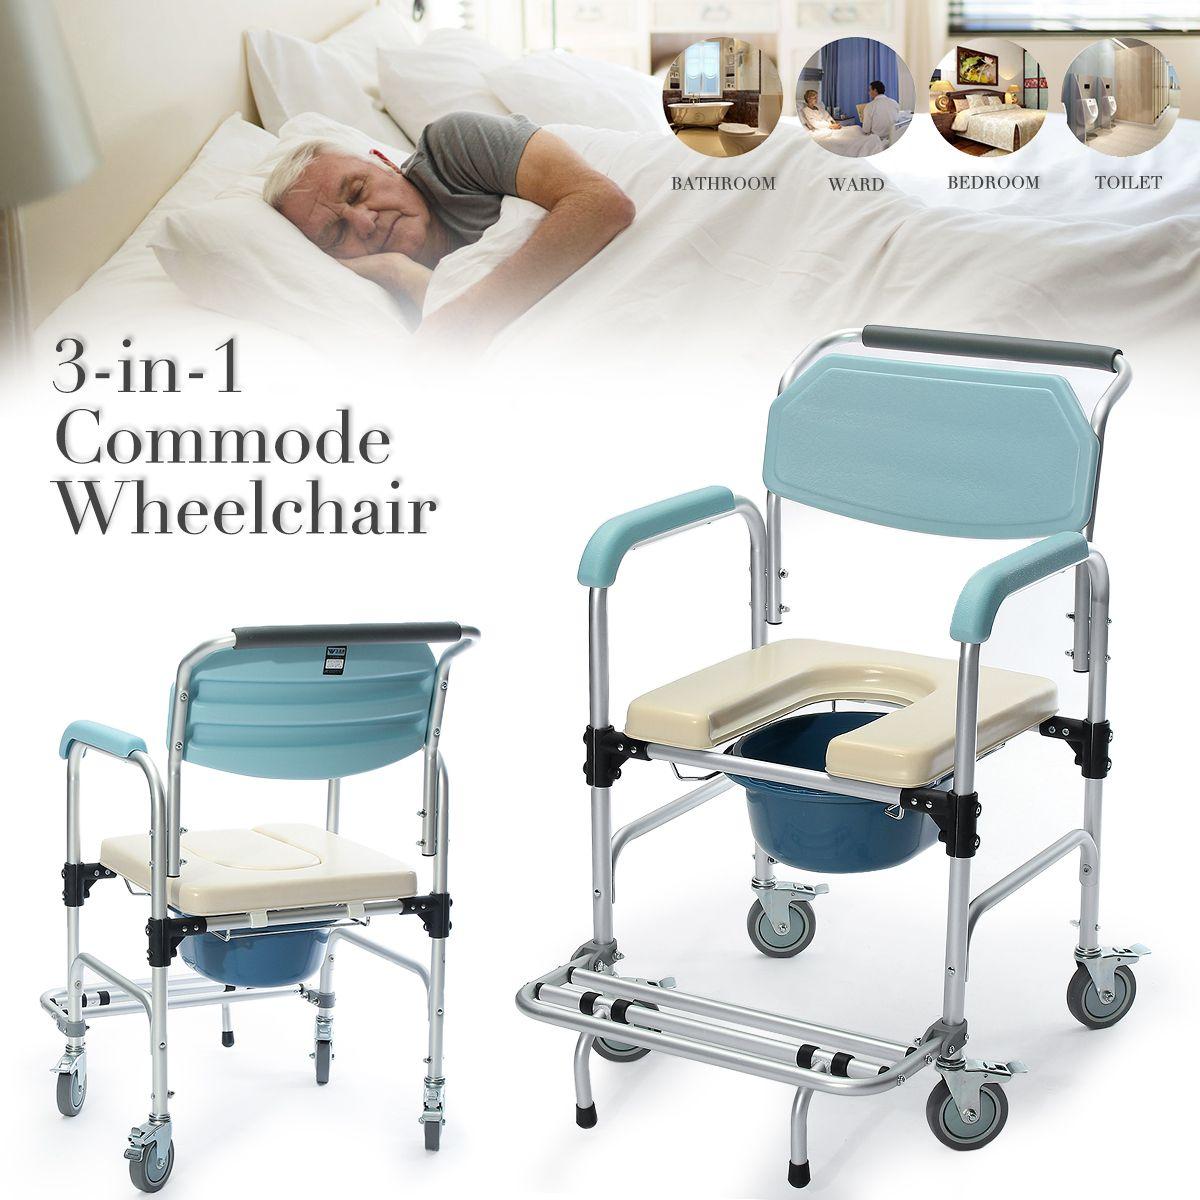 3-in-1 Commode Wheelchair Bedside Toilet & Shower Seat Bathroom Rolling Chair Elder Folding Chair Aluminum Alloy Waterproof